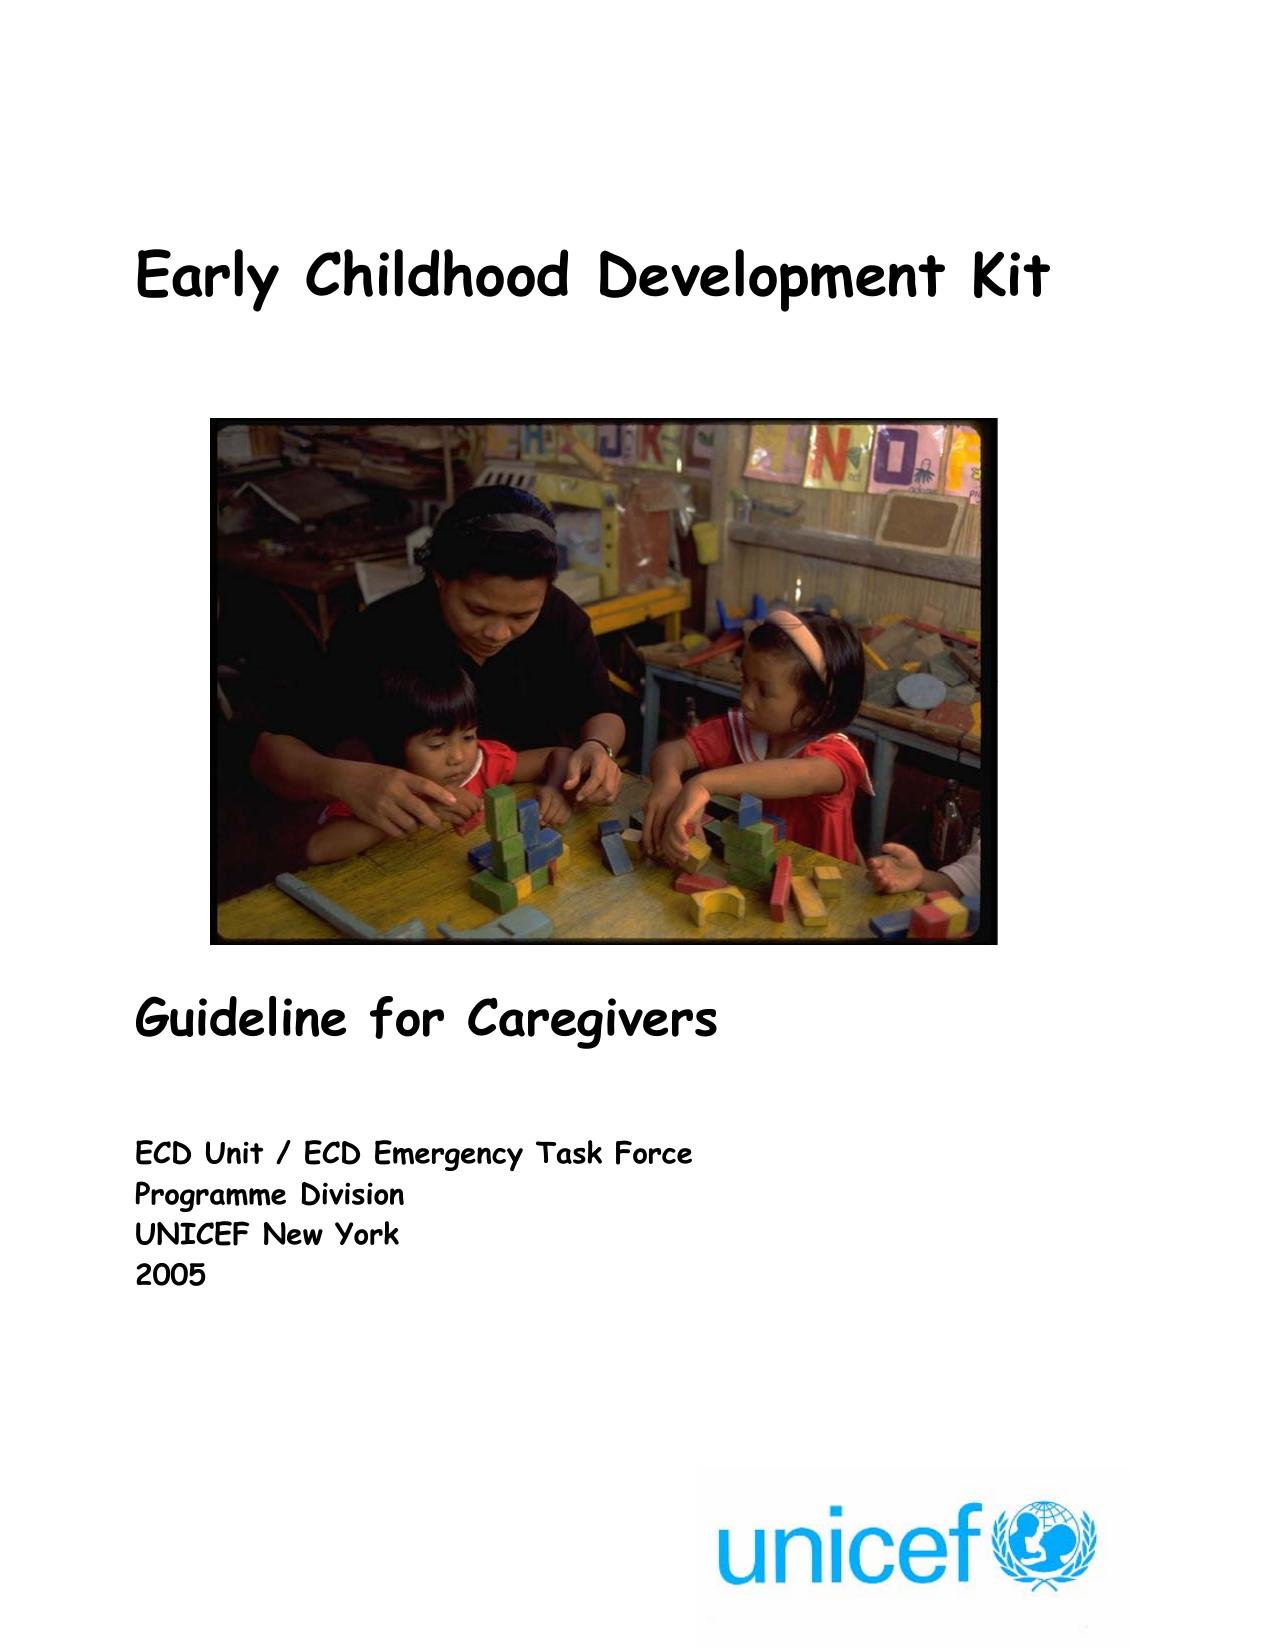 Early childhood development kit sciox Choice Image